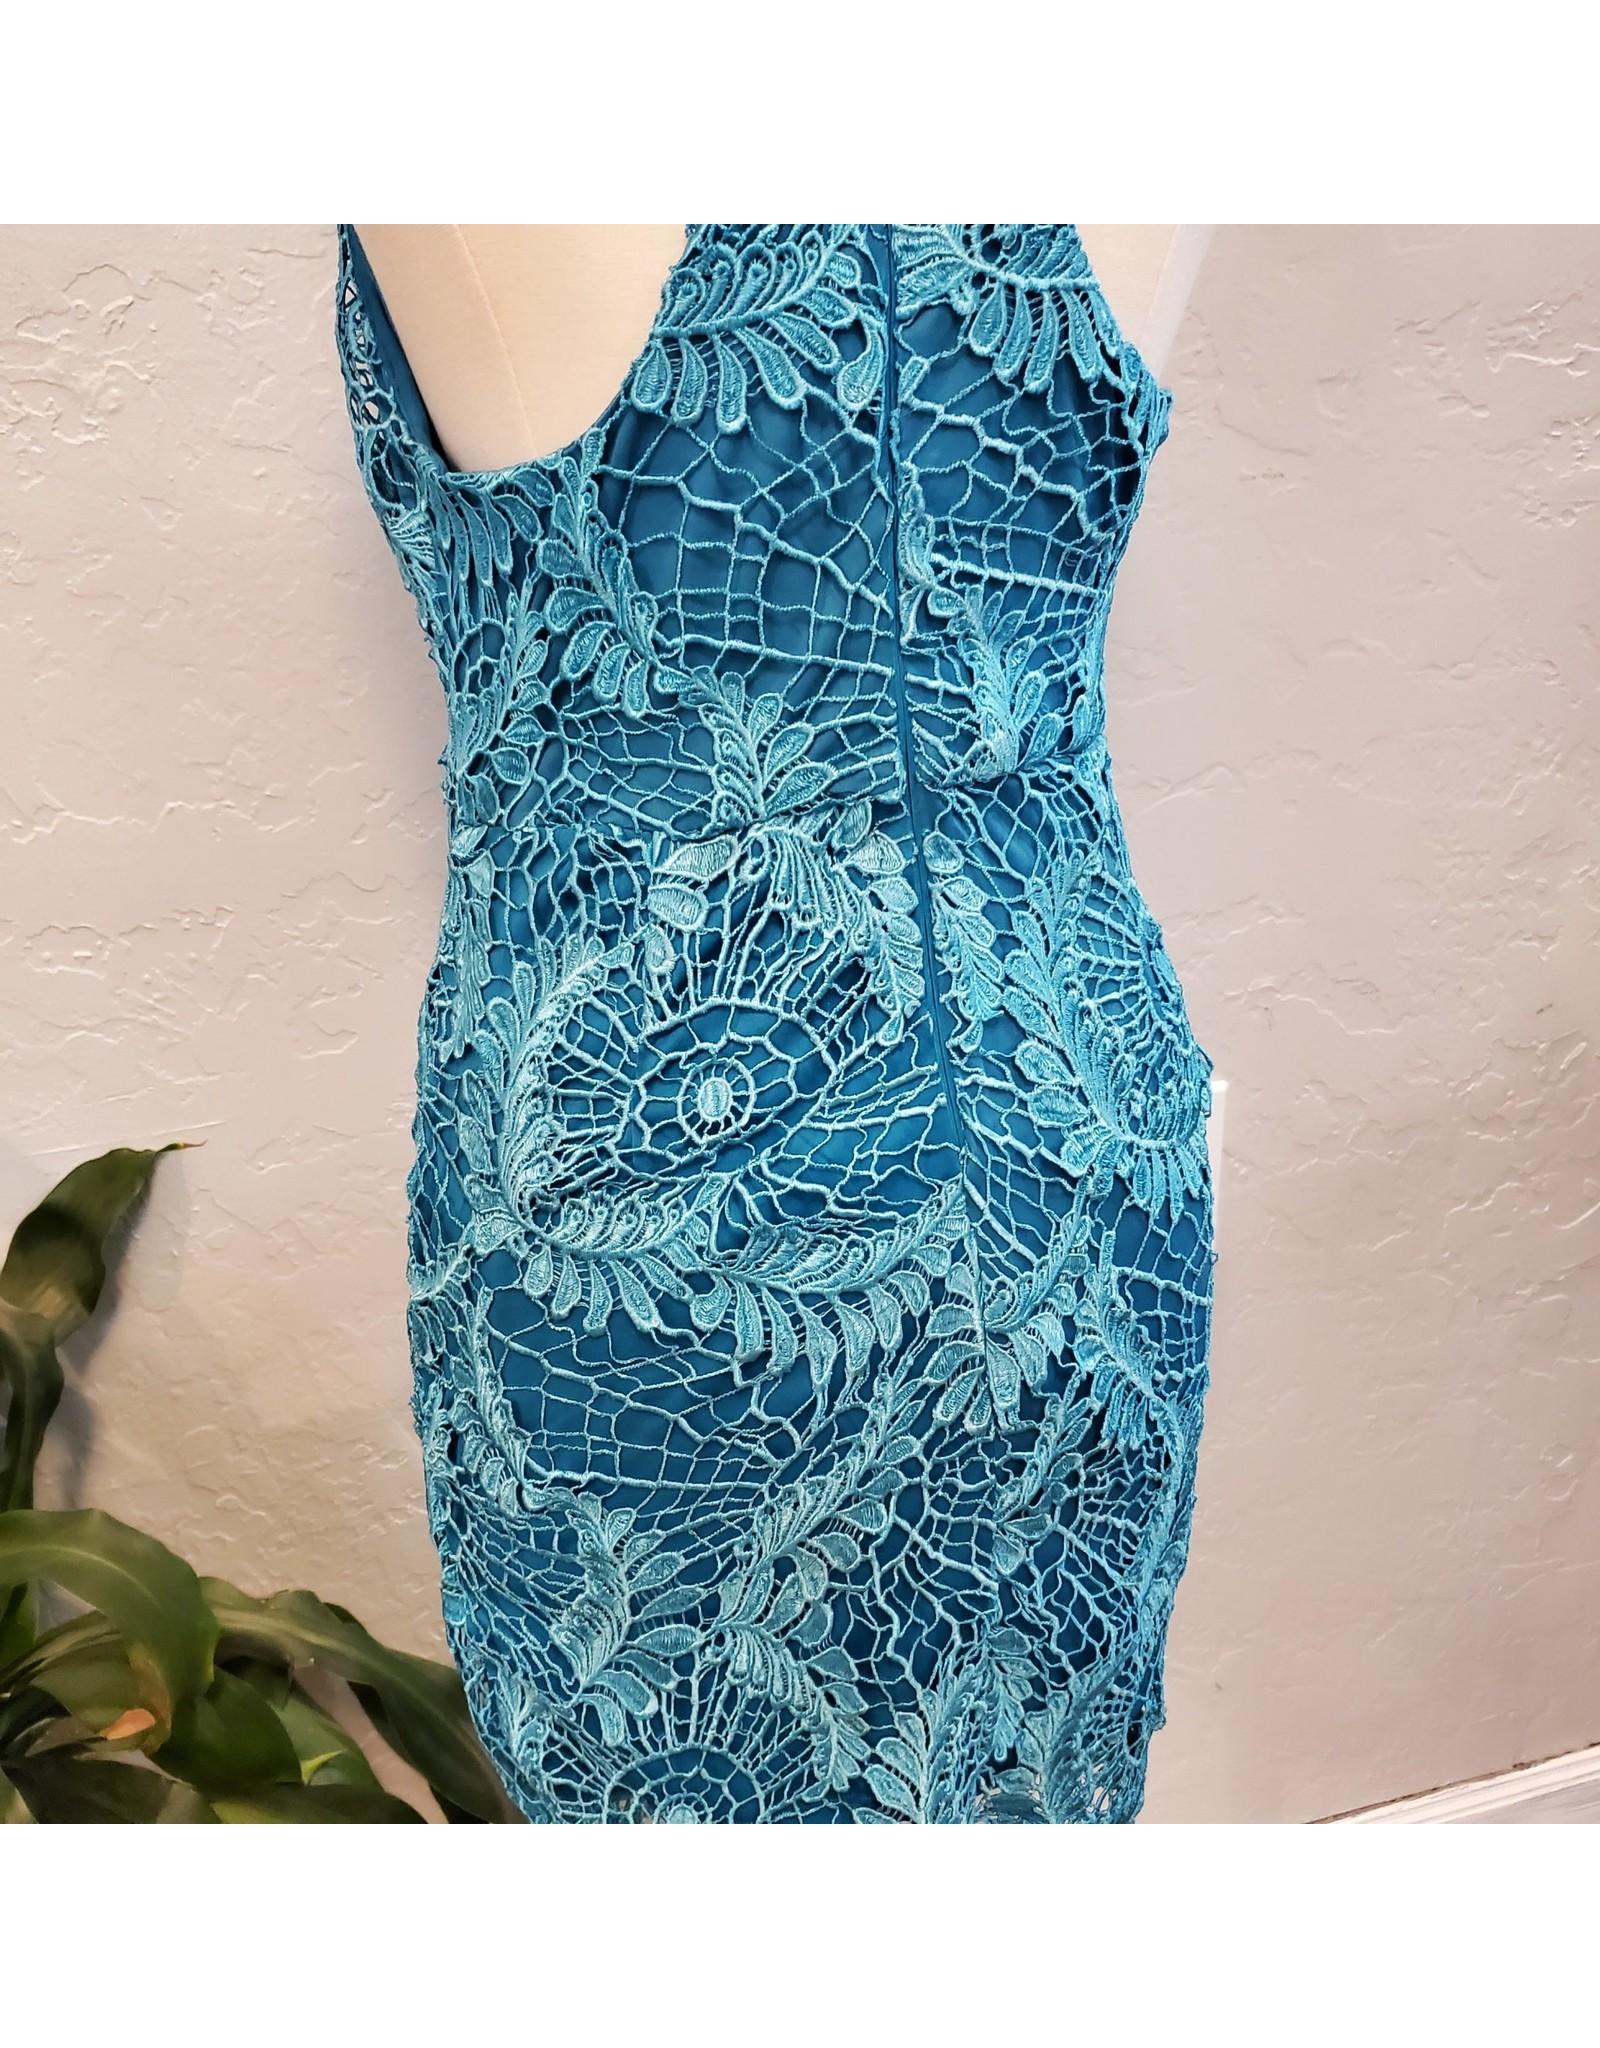 Turquoise Crochet Dress